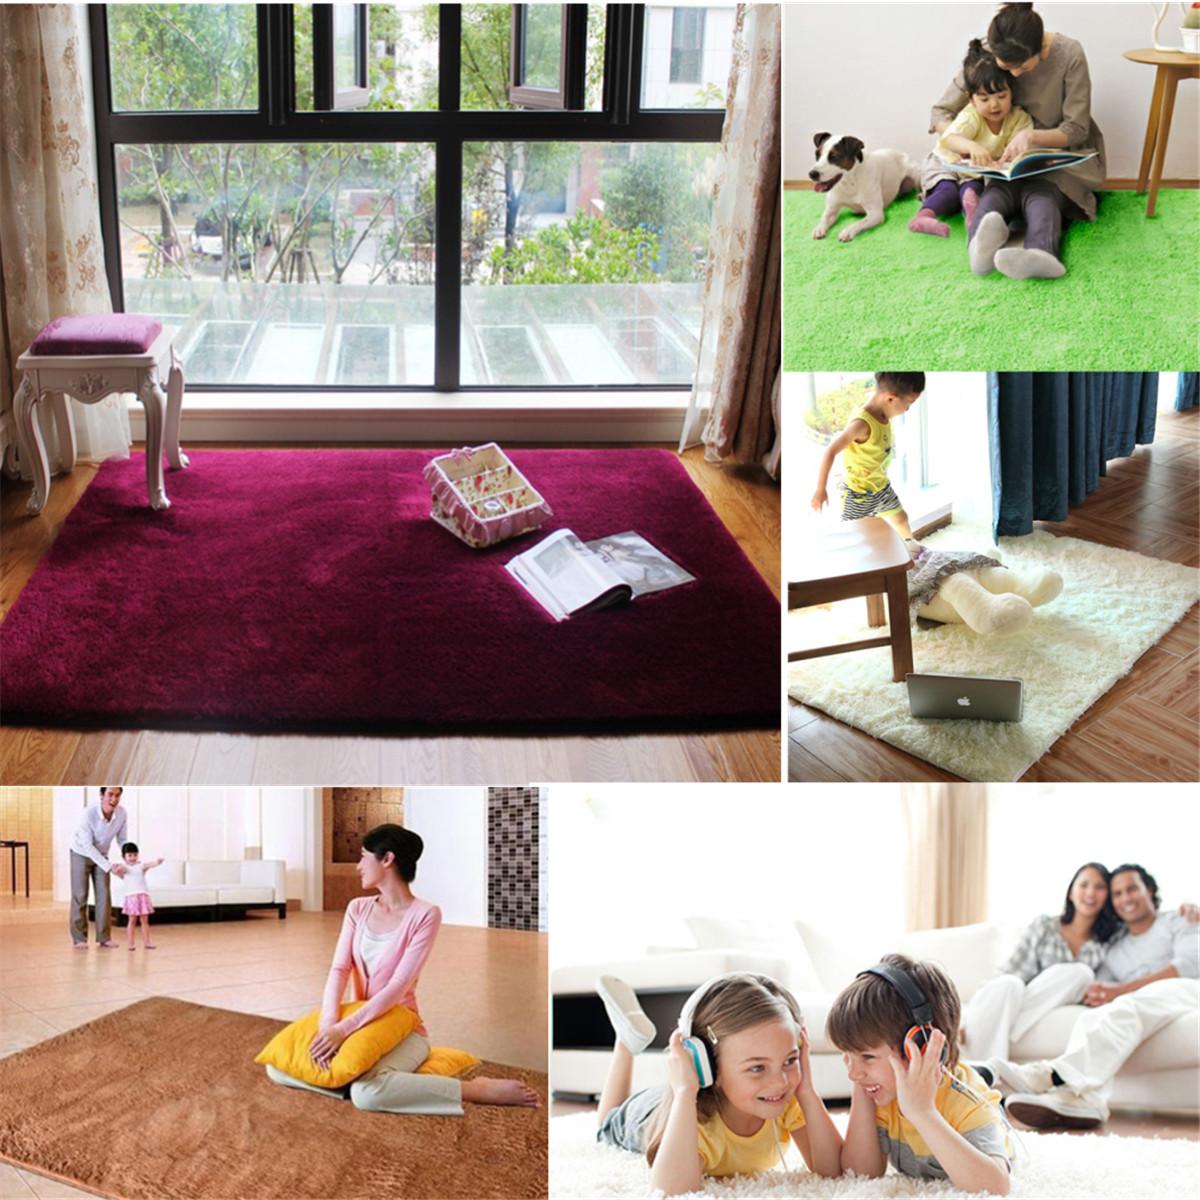 Living Room Carpet Rugs Shaggy Anti Skid Carpets Rugs Floor Mat Cover 80x120cm Khaki